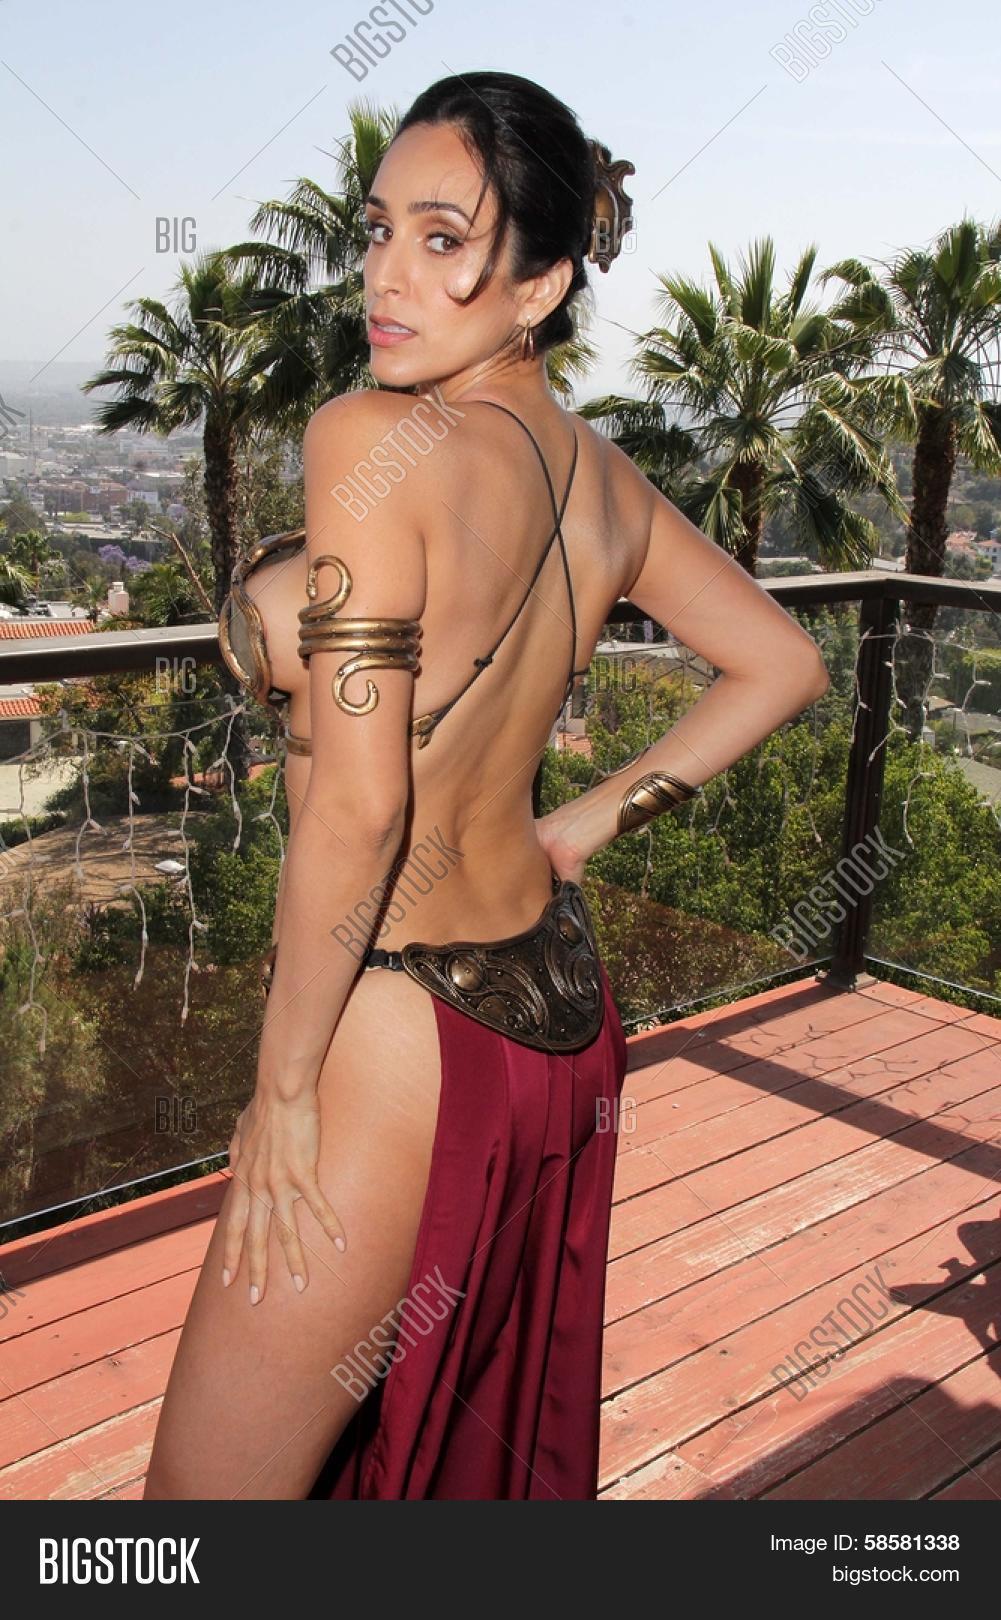 Valerie Perez naked (47 photo), Tits, Fappening, Instagram, braless 2020